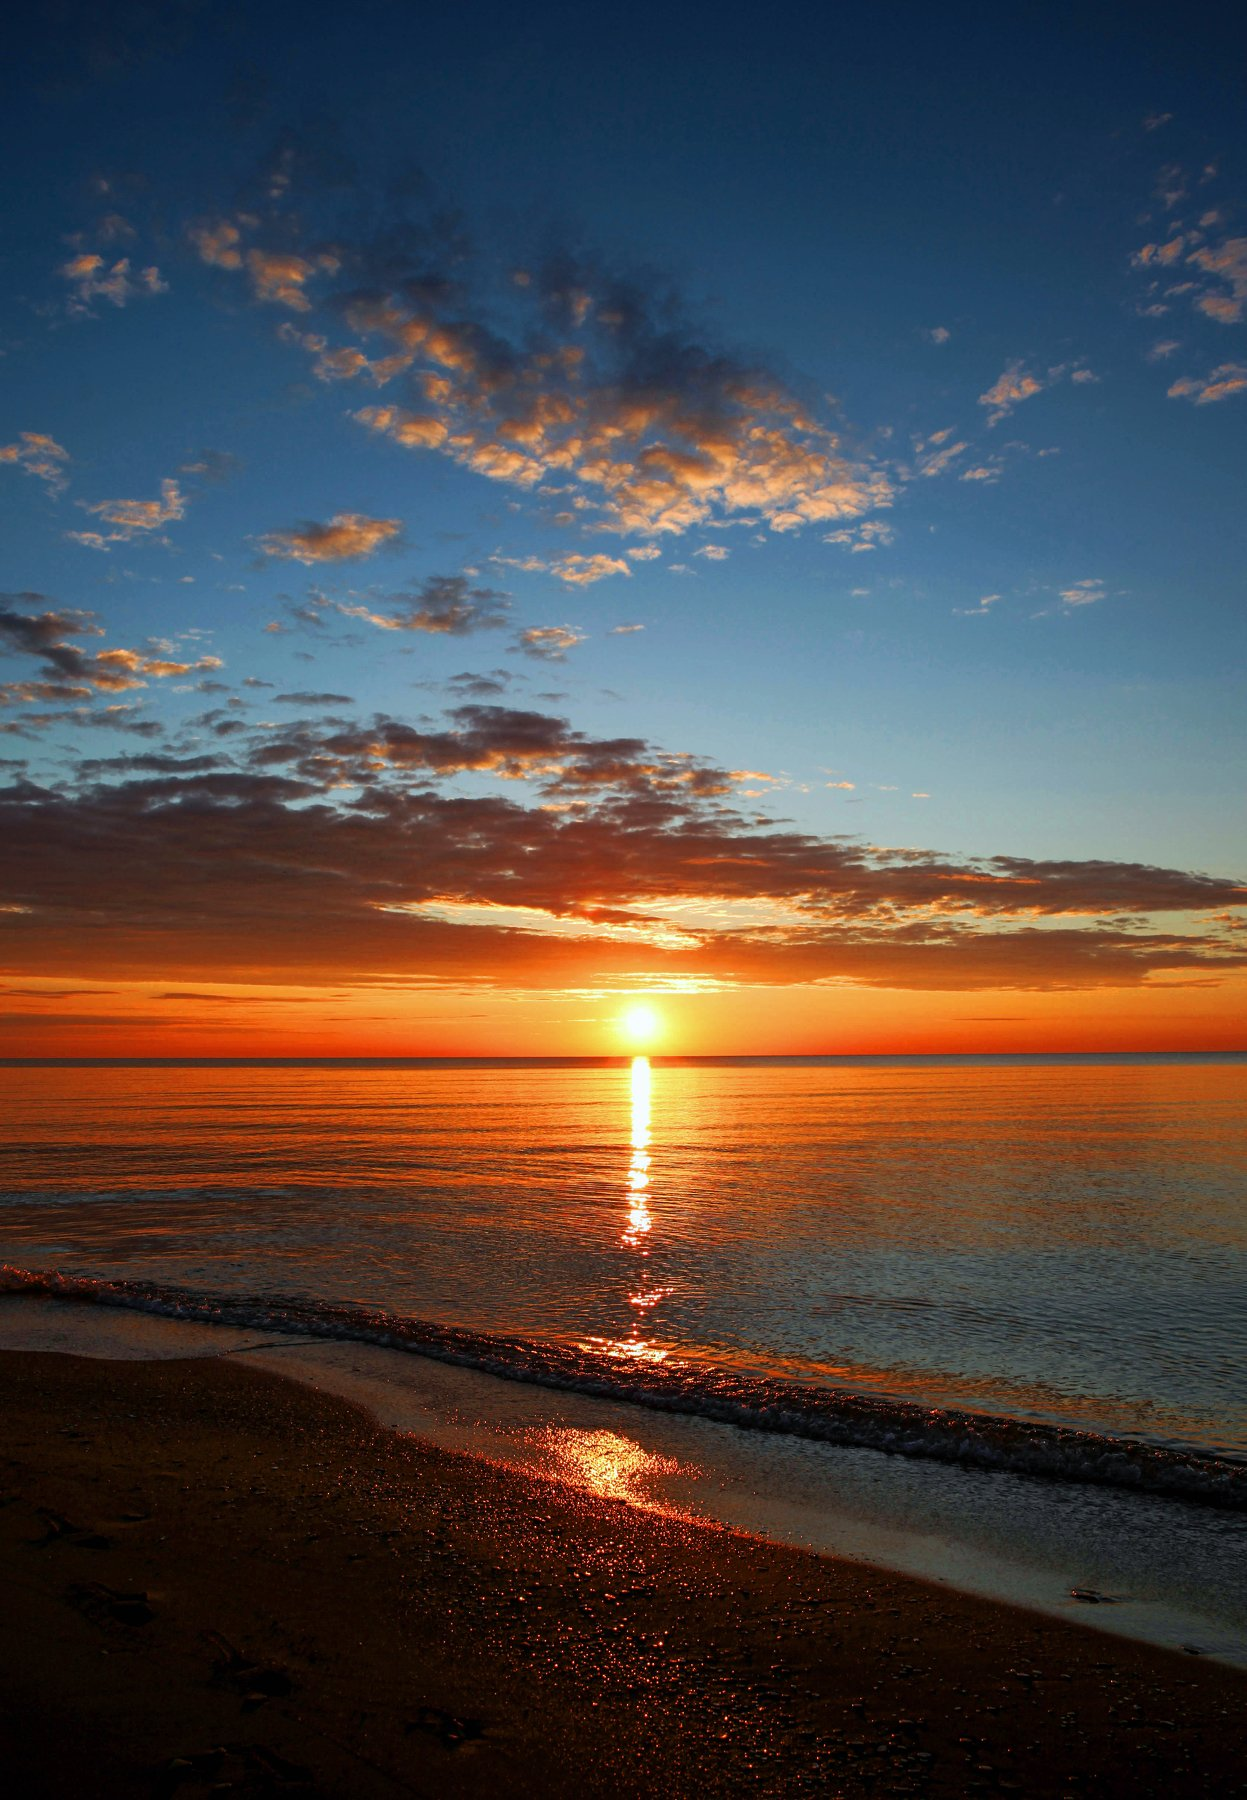 рассвет,море,каспийское море,, Марат Магов